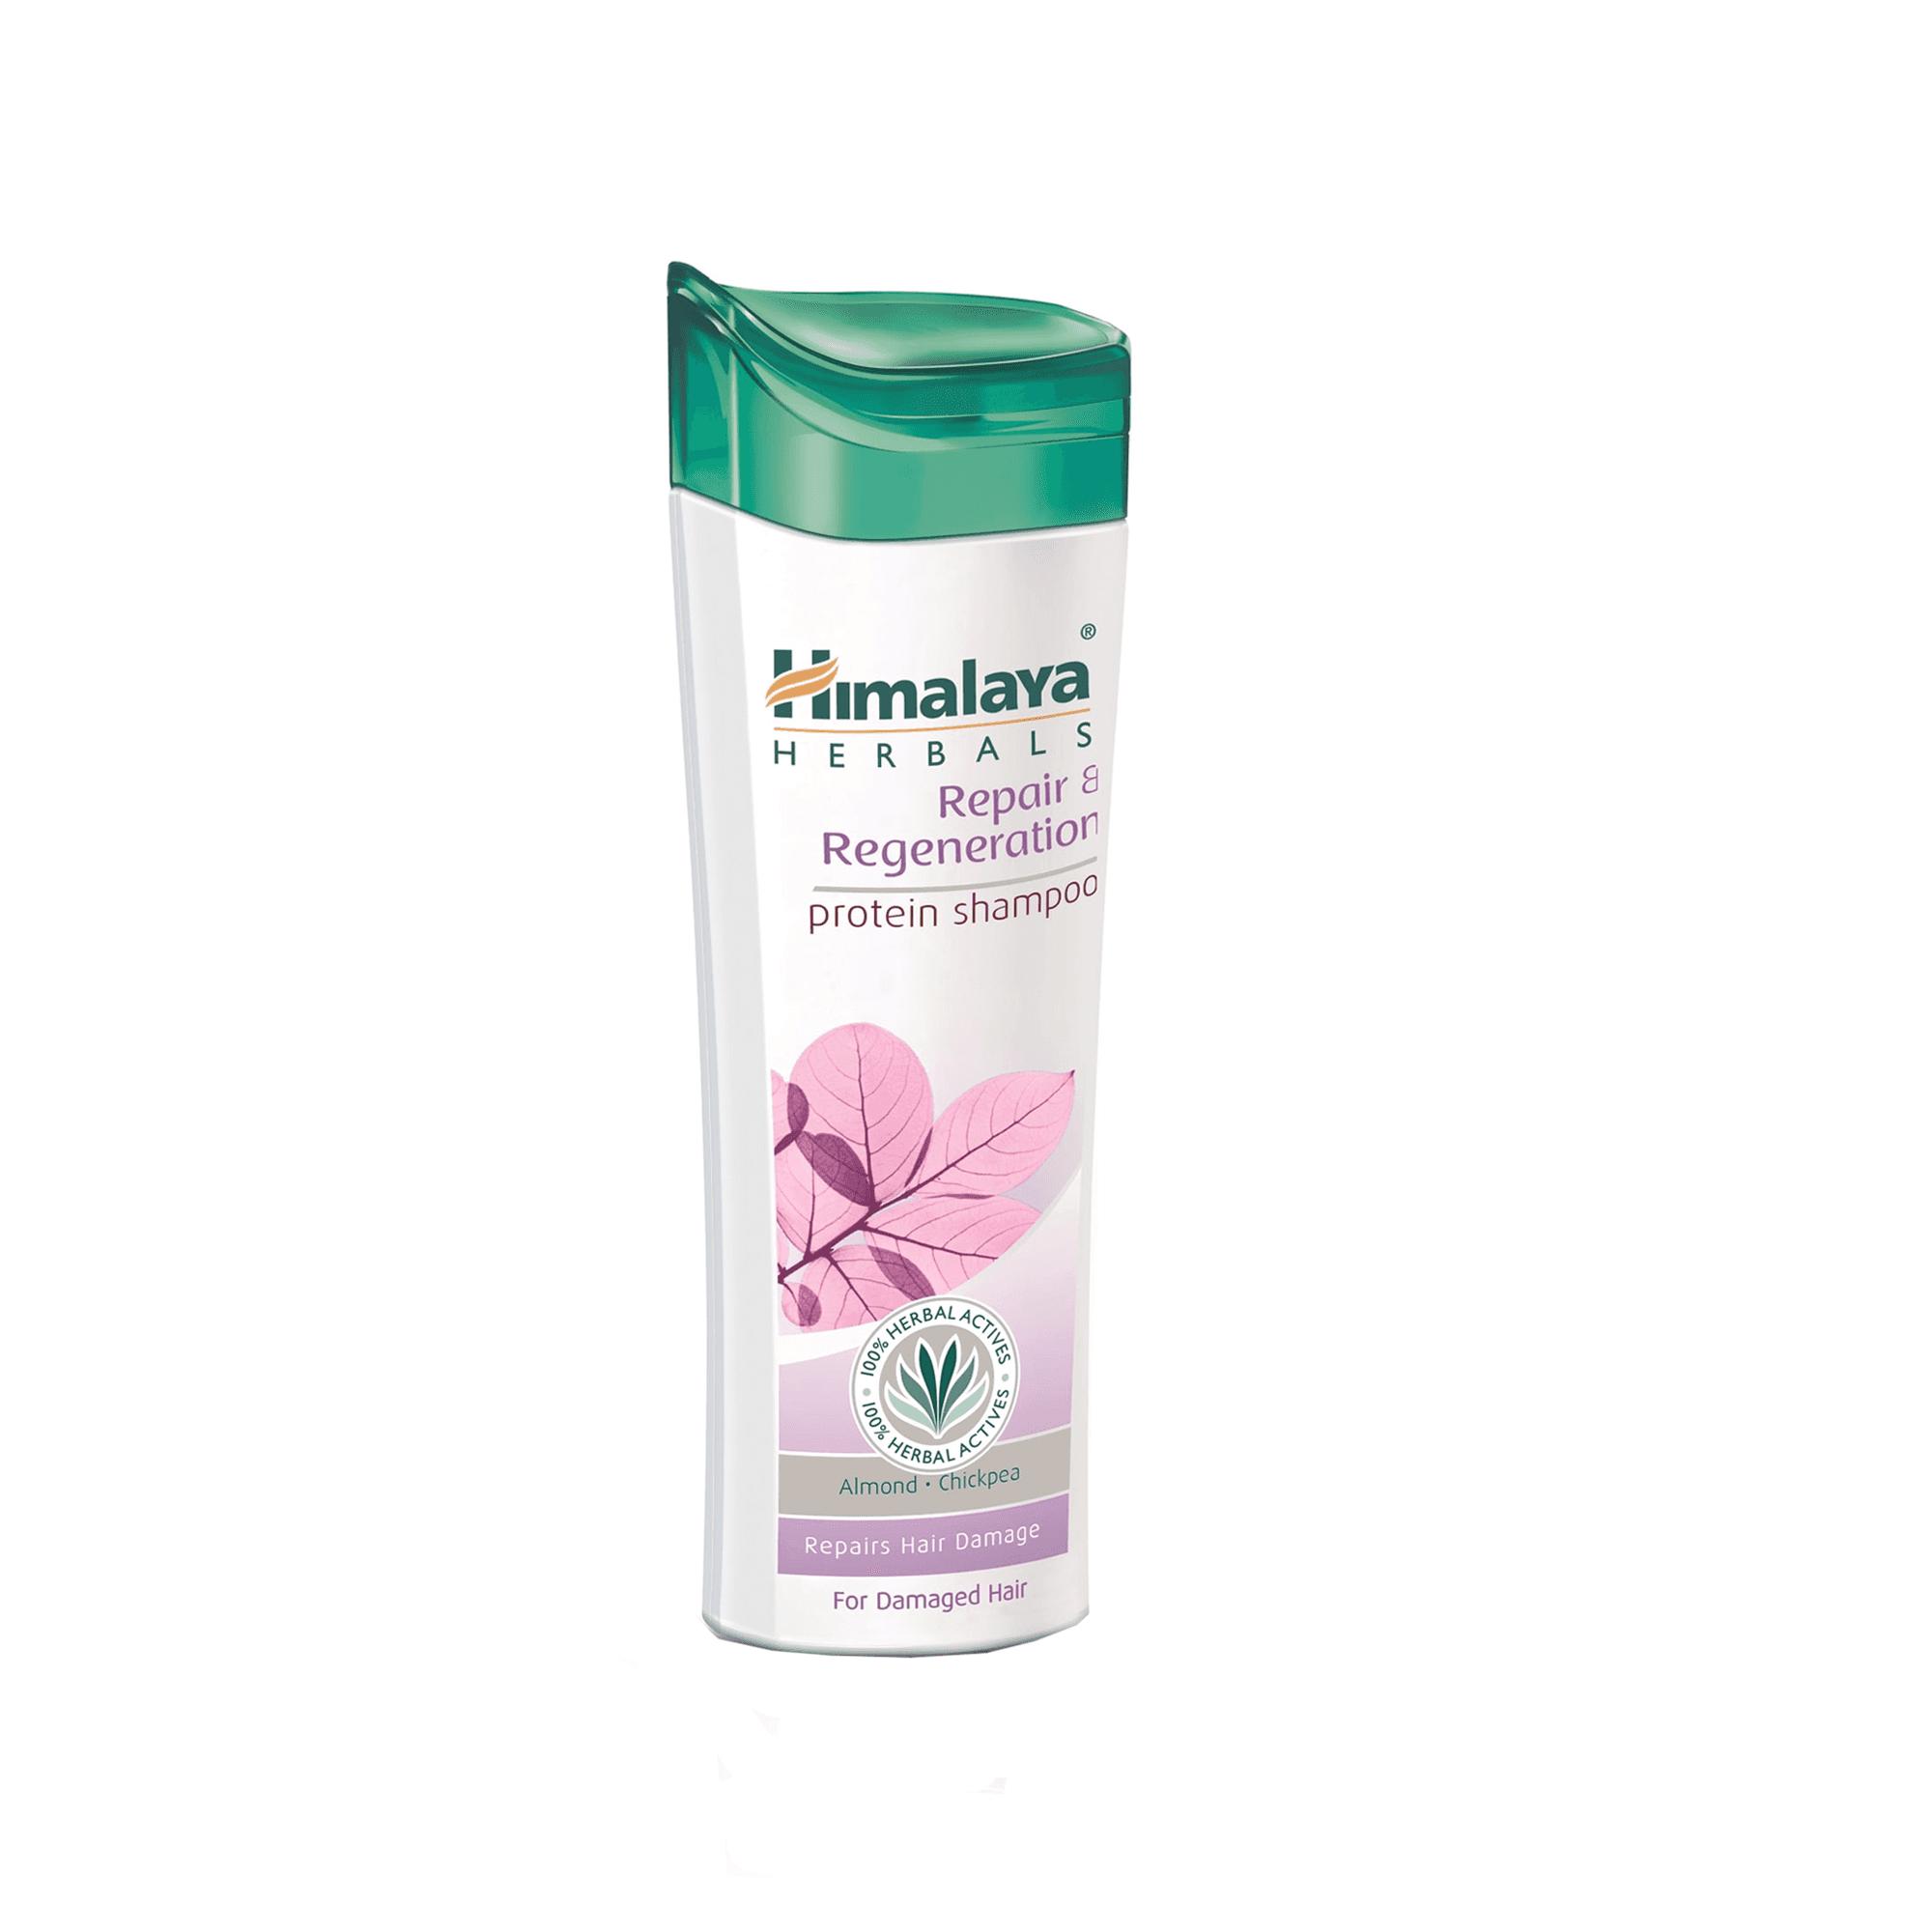 Himalaya Repair & Regeneration Protein Shampoo - 200 ml